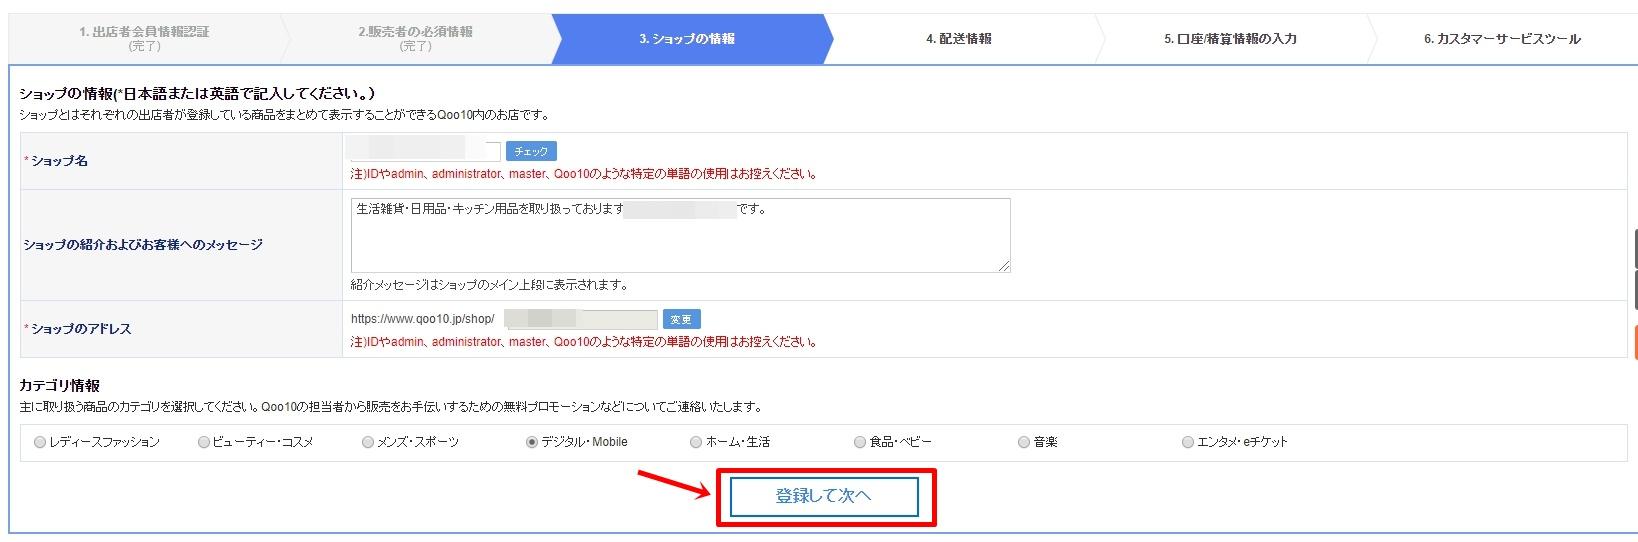 Qoo10の出店登録申請手順